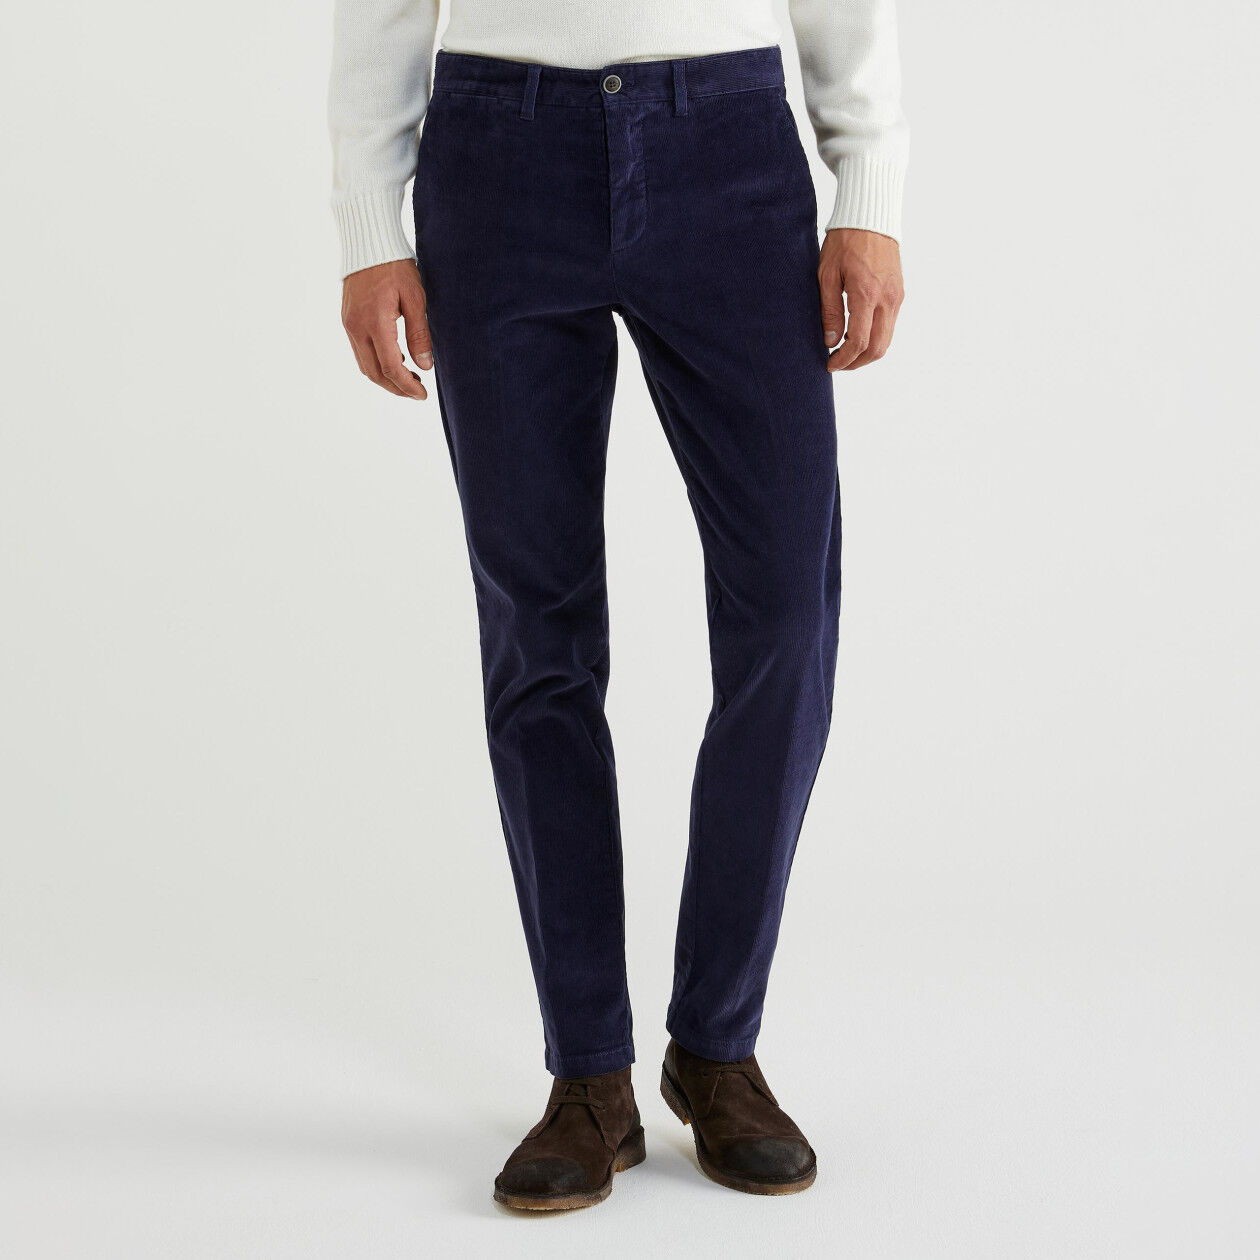 Pantaloni slim fit in velluto